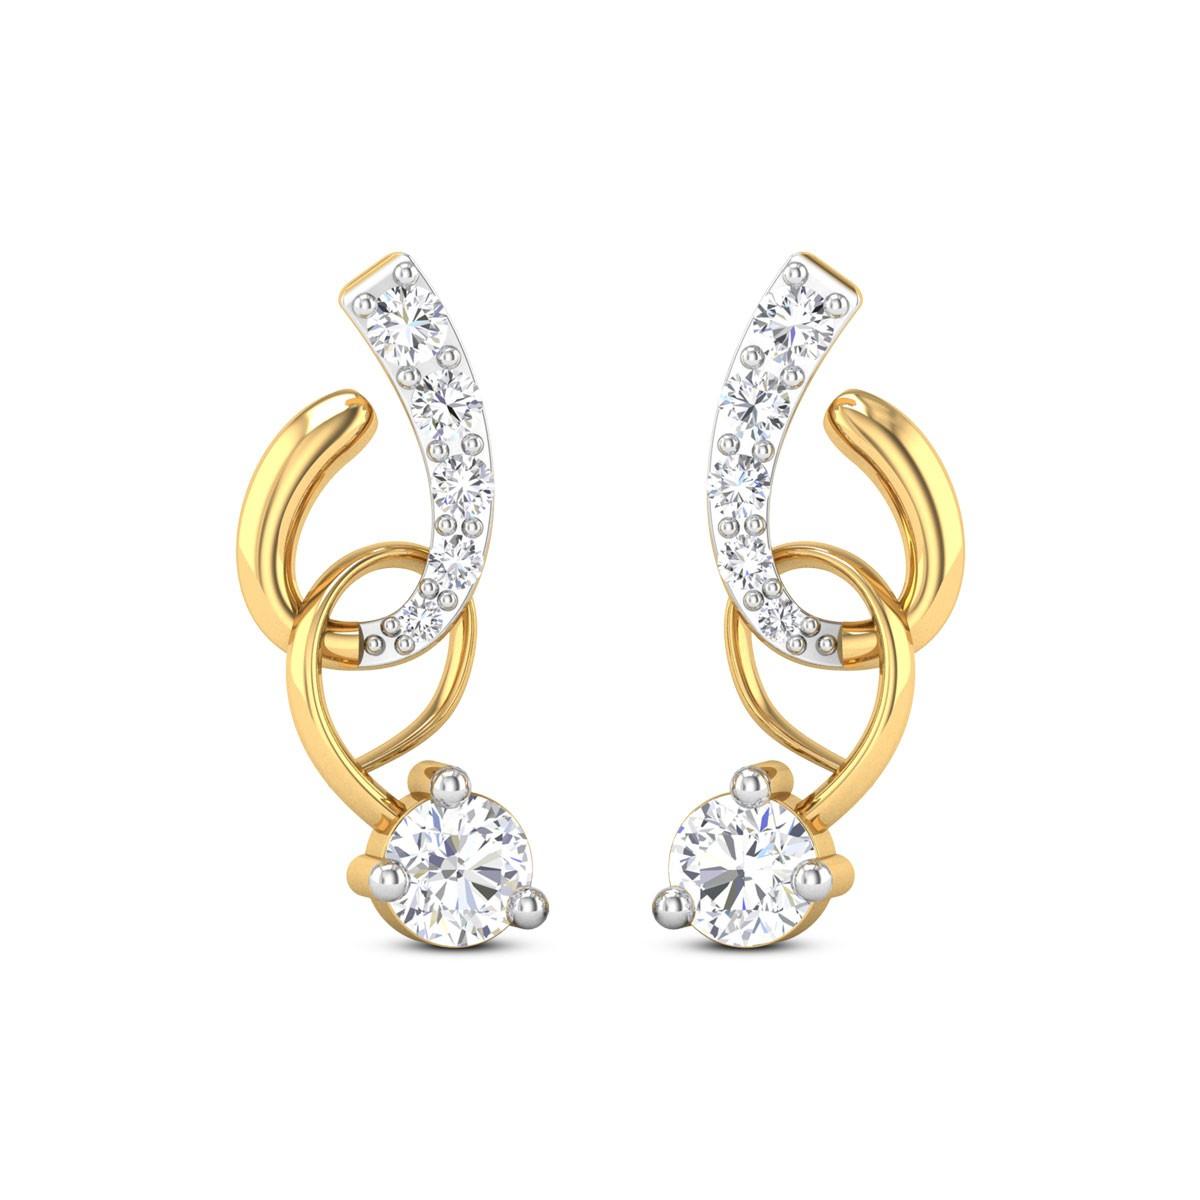 Ophelia Diamond Earrings